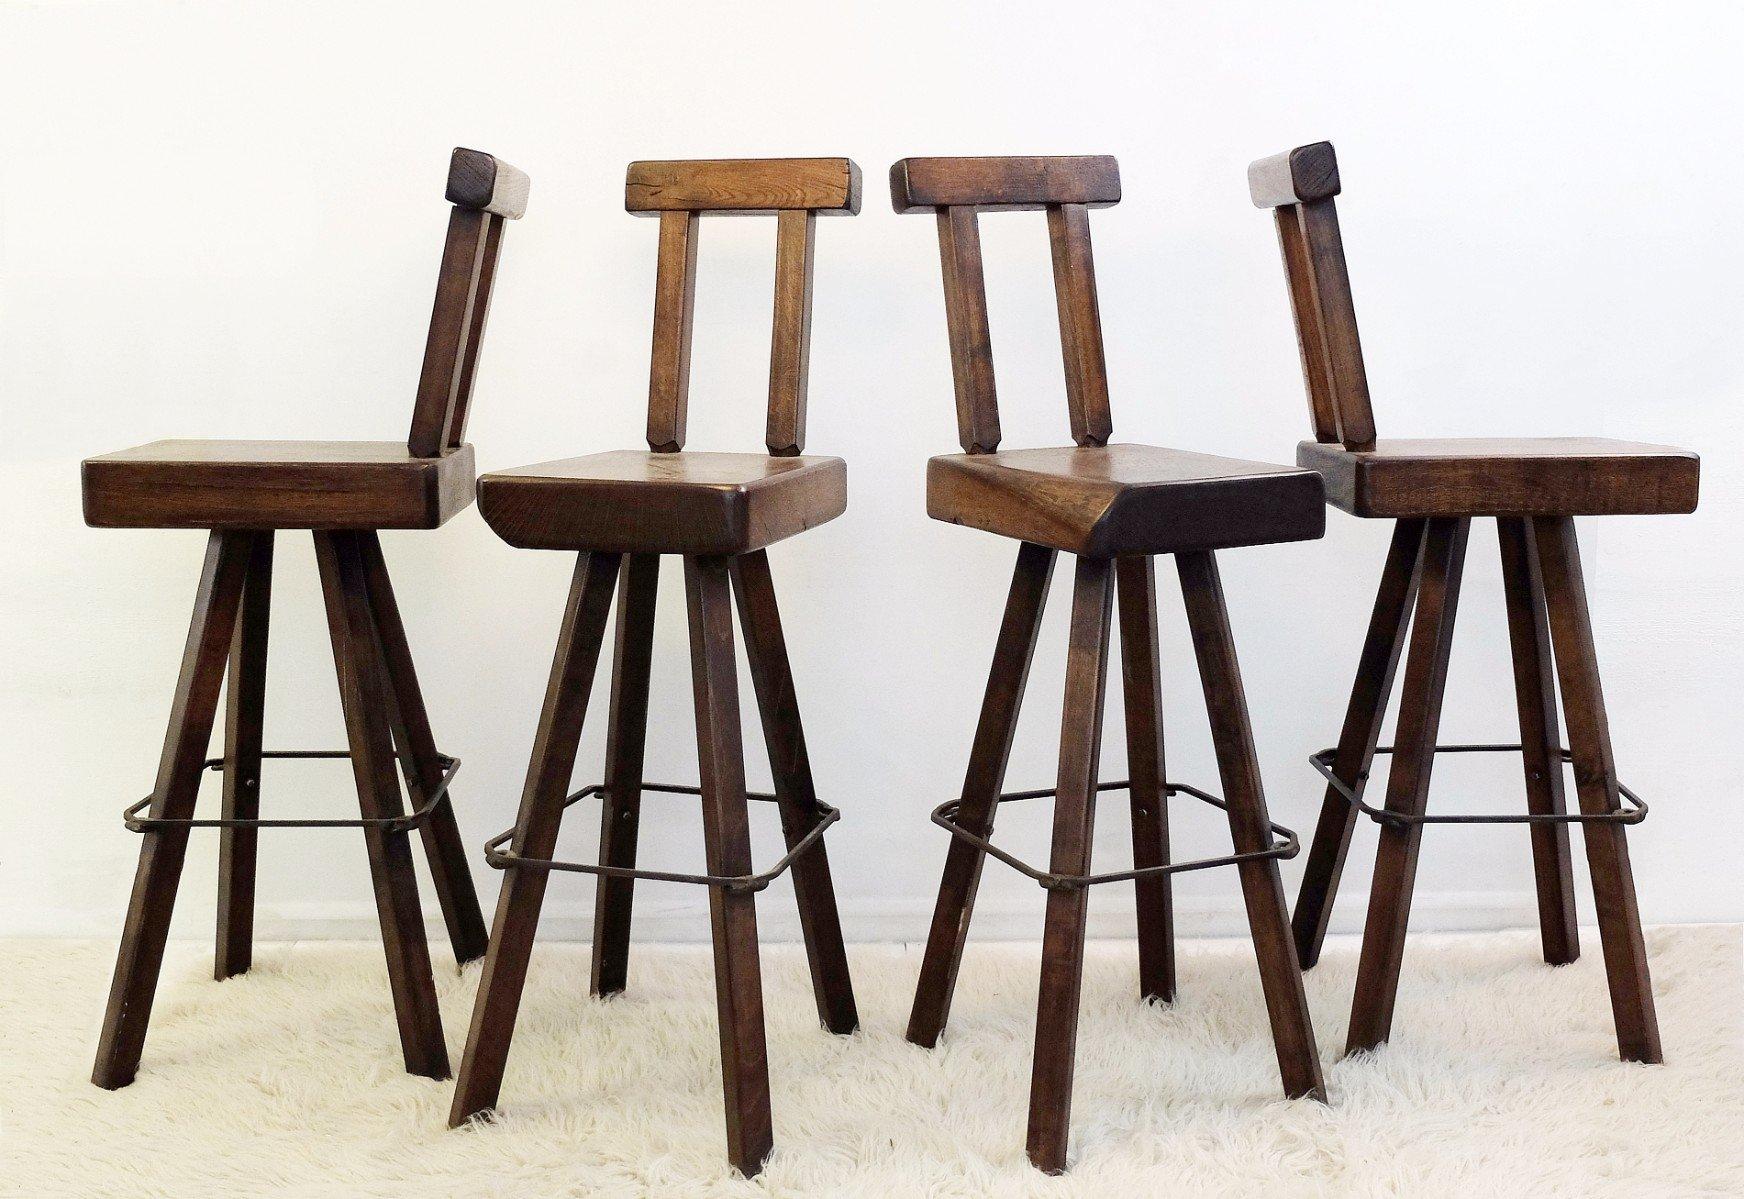 drehbare barhocker aus massivholz 4er set bei pamono kaufen. Black Bedroom Furniture Sets. Home Design Ideas